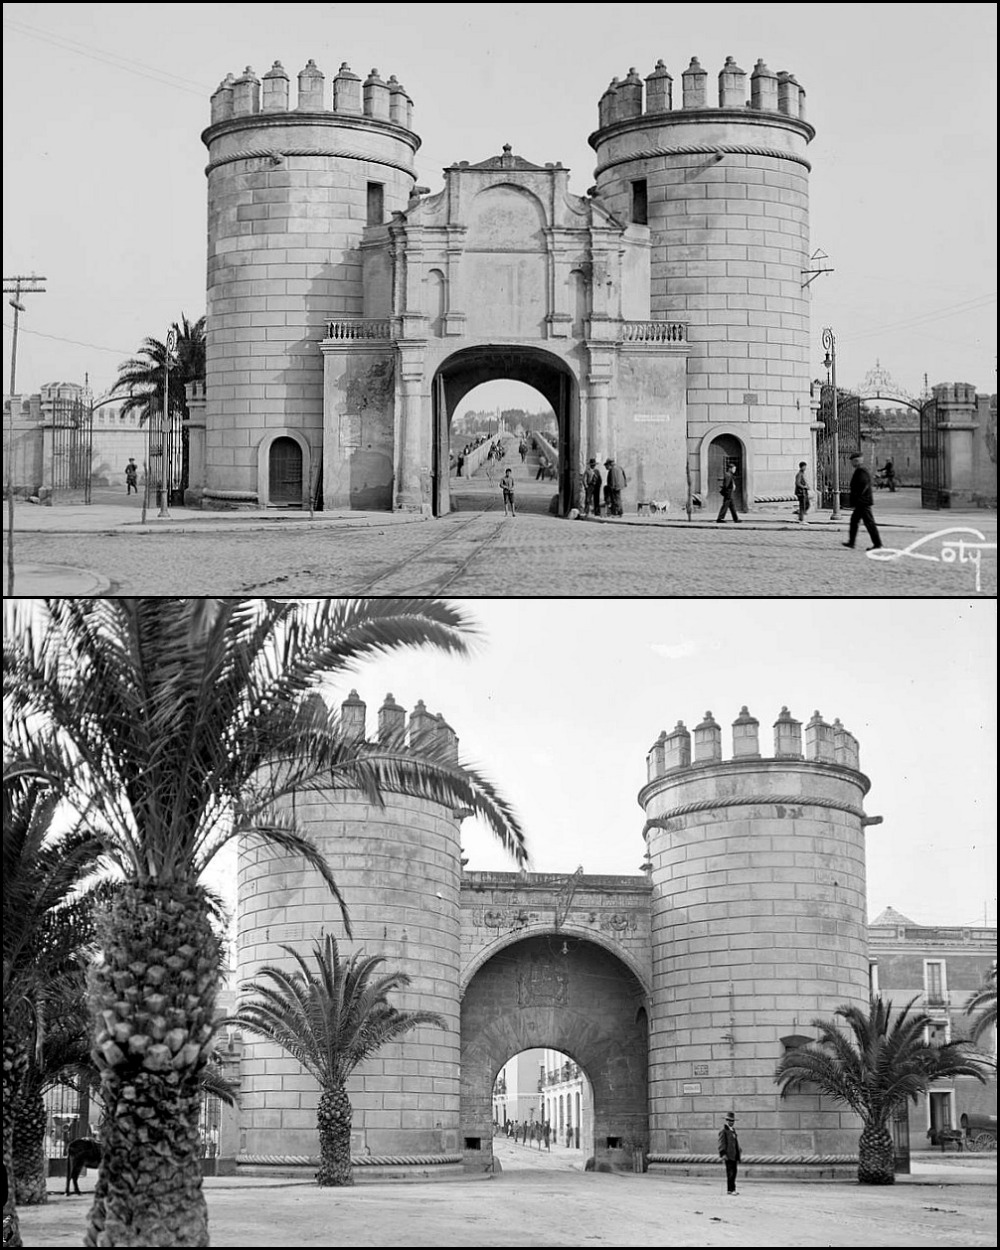 Badajoz a os treinta guiris por extremadura blogs - Puertas las palmas ...